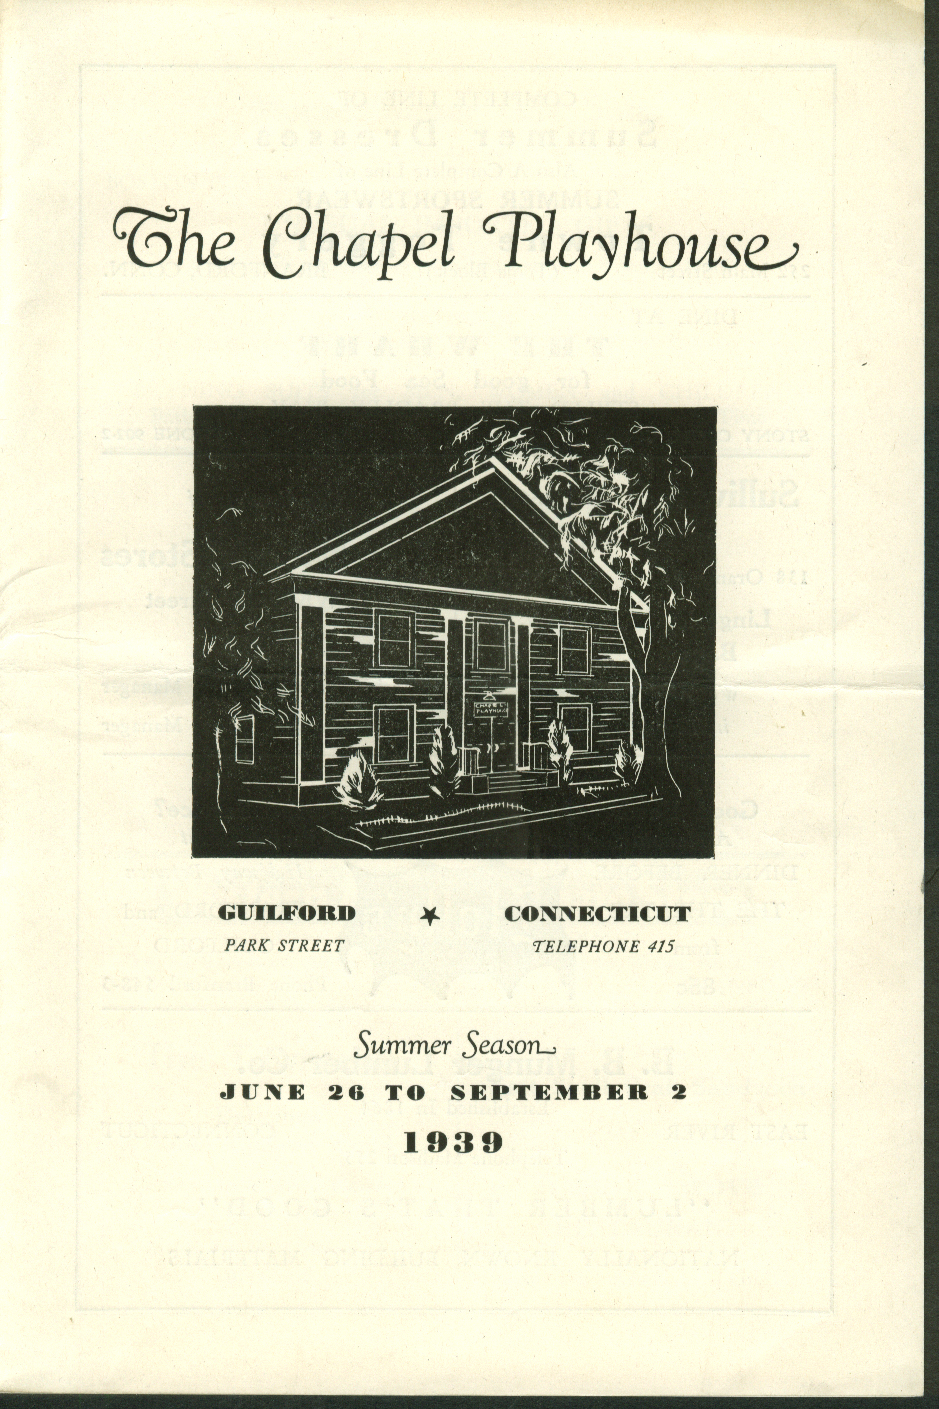 Chapel Playhouse Summer 1939 Program Elissa Landi Tovarich